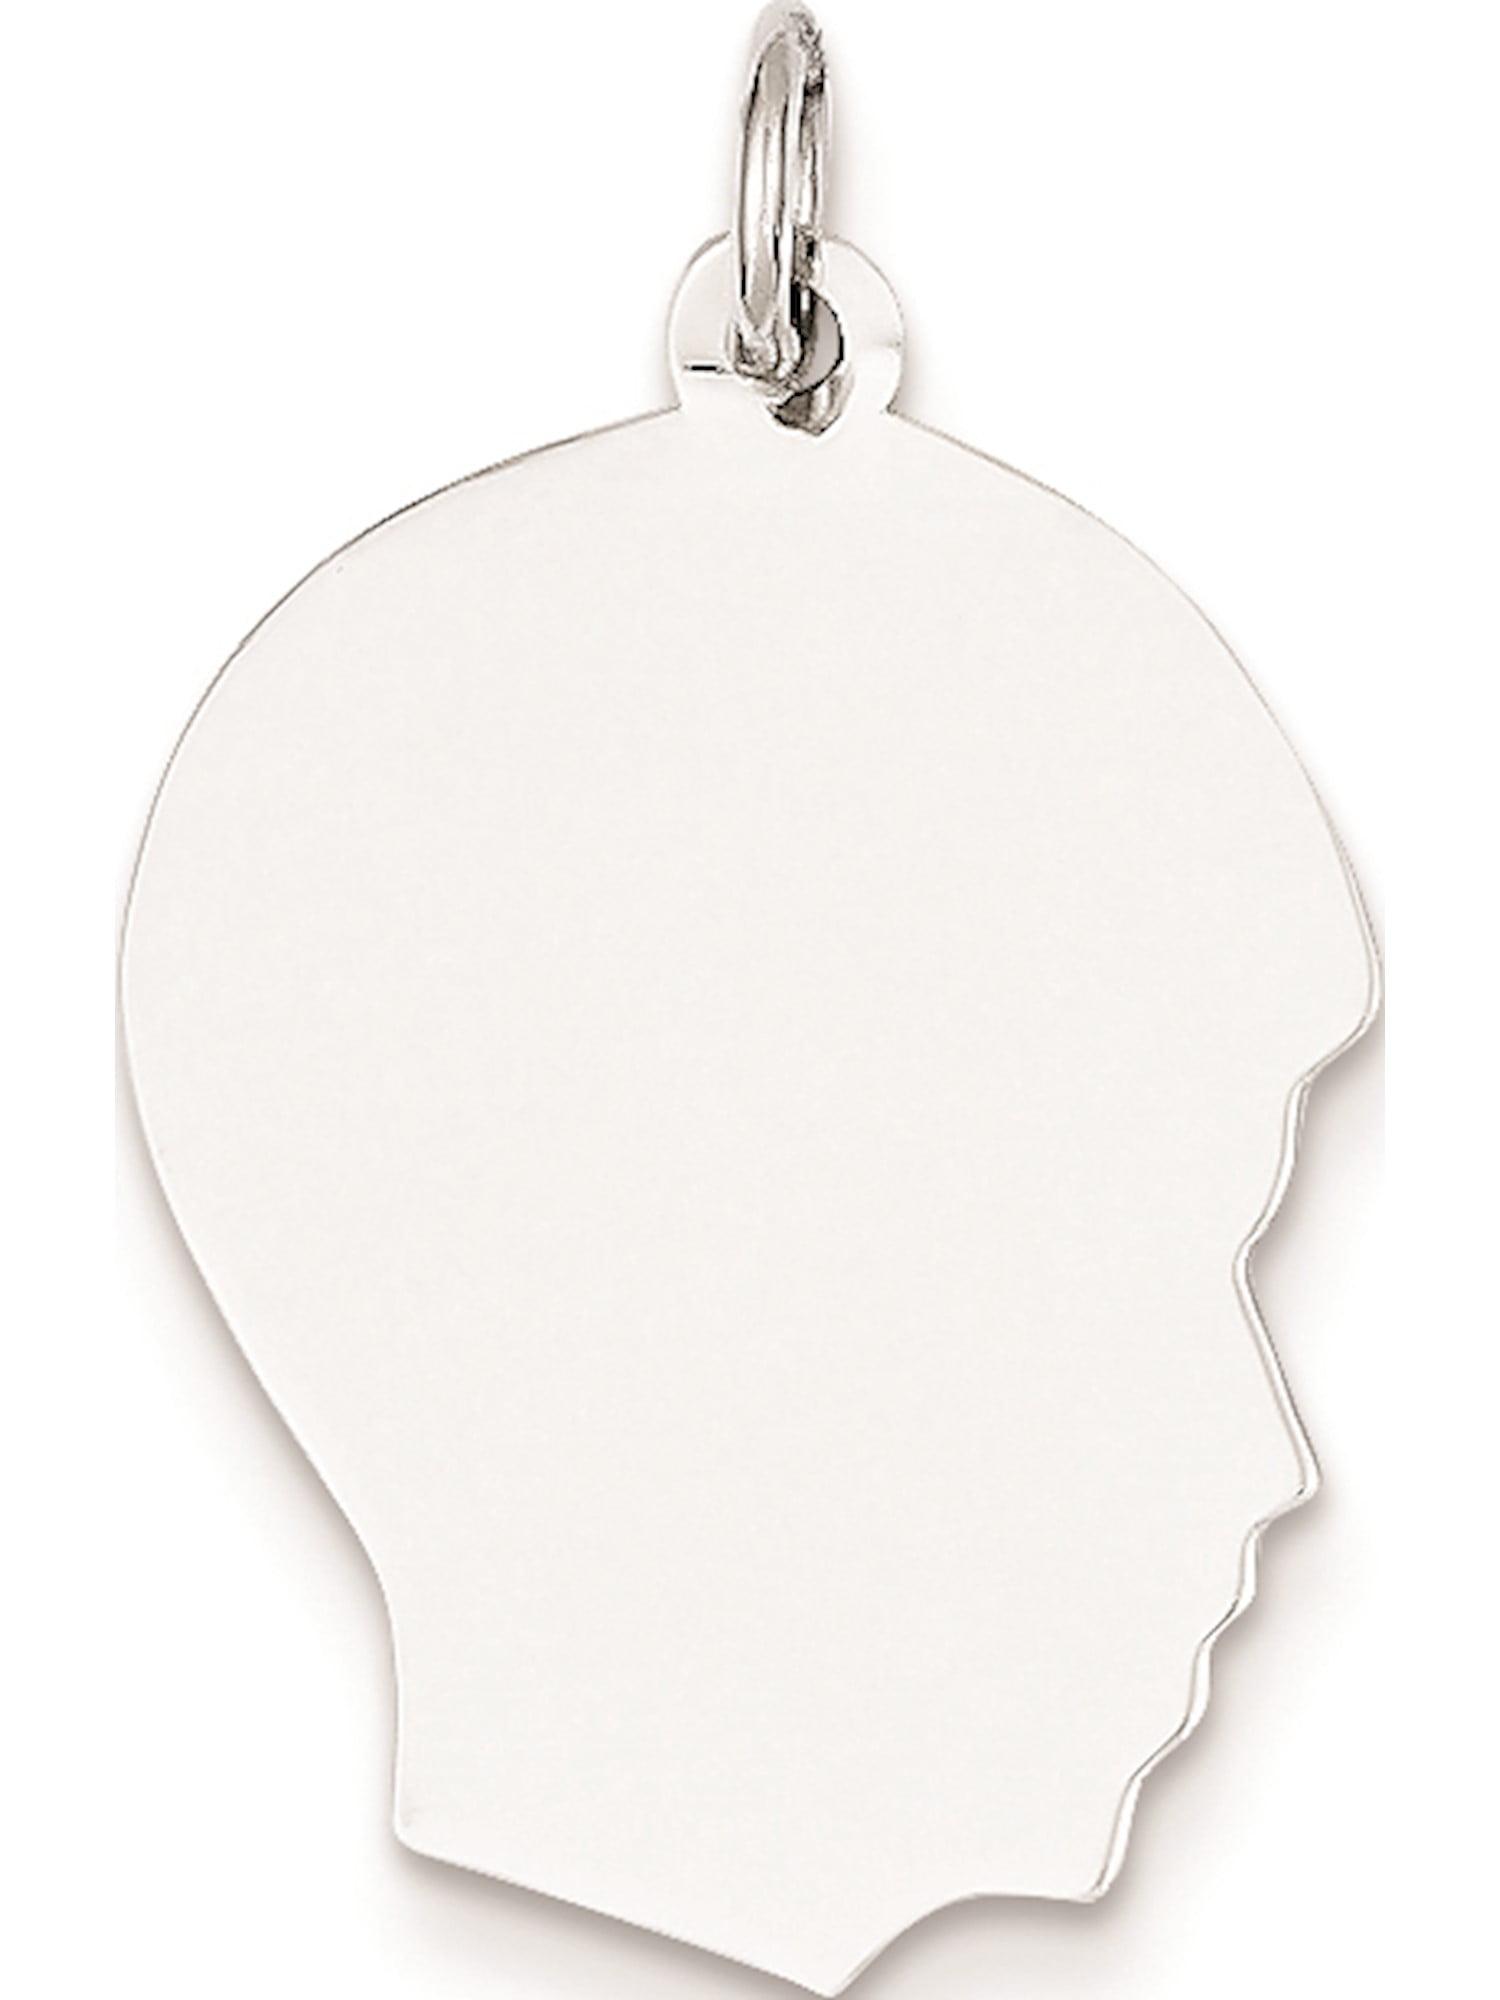 6f8dc9ec6 14k White Gold Plain Medium Facing Right Engravable Boy (17x29mm) Pendant /  Charm - zoomed image